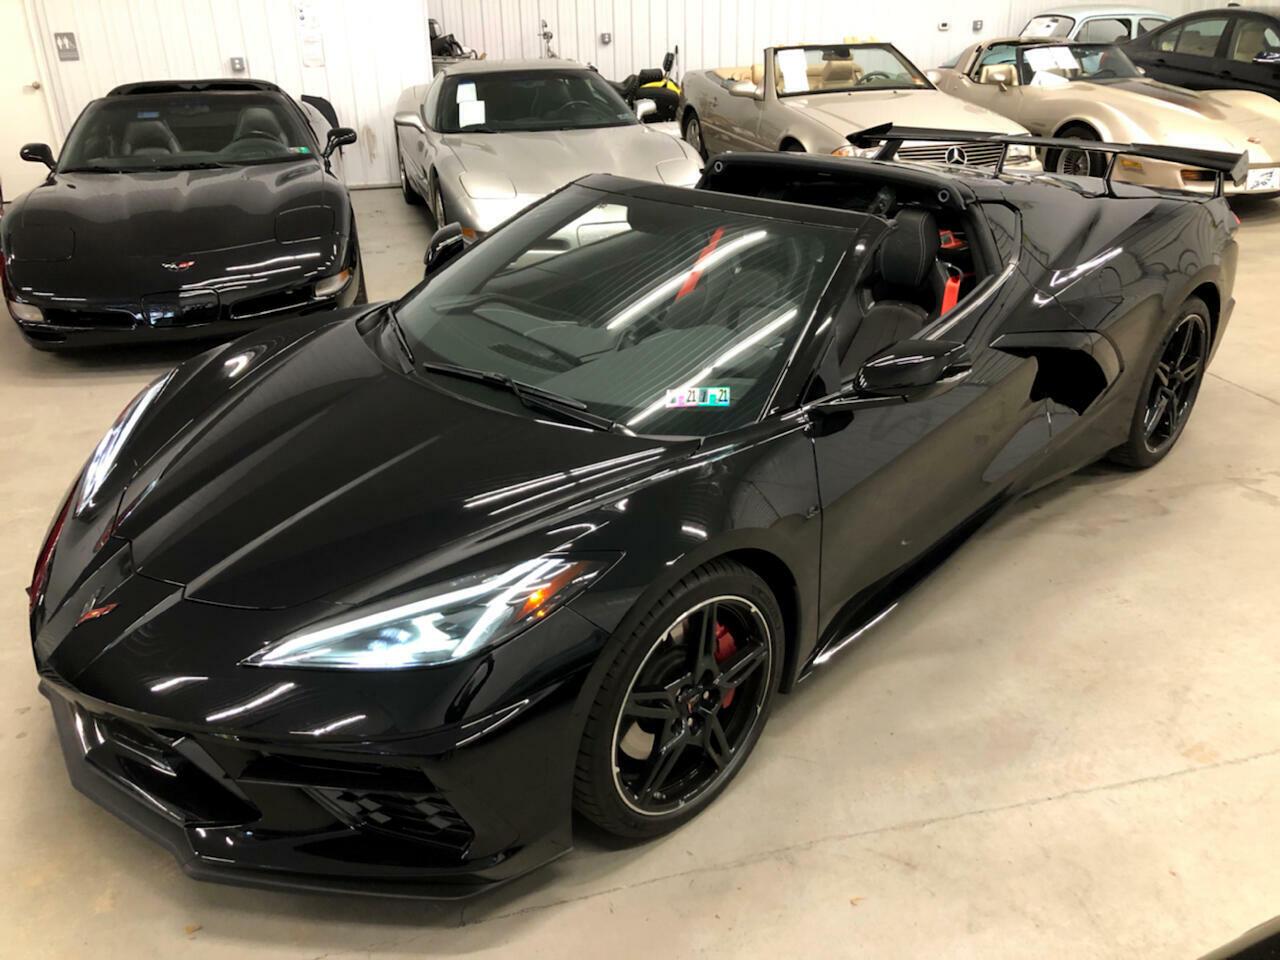 2020 Black Chevrolet Corvette Coupe 1LT | C7 Corvette Photo 3